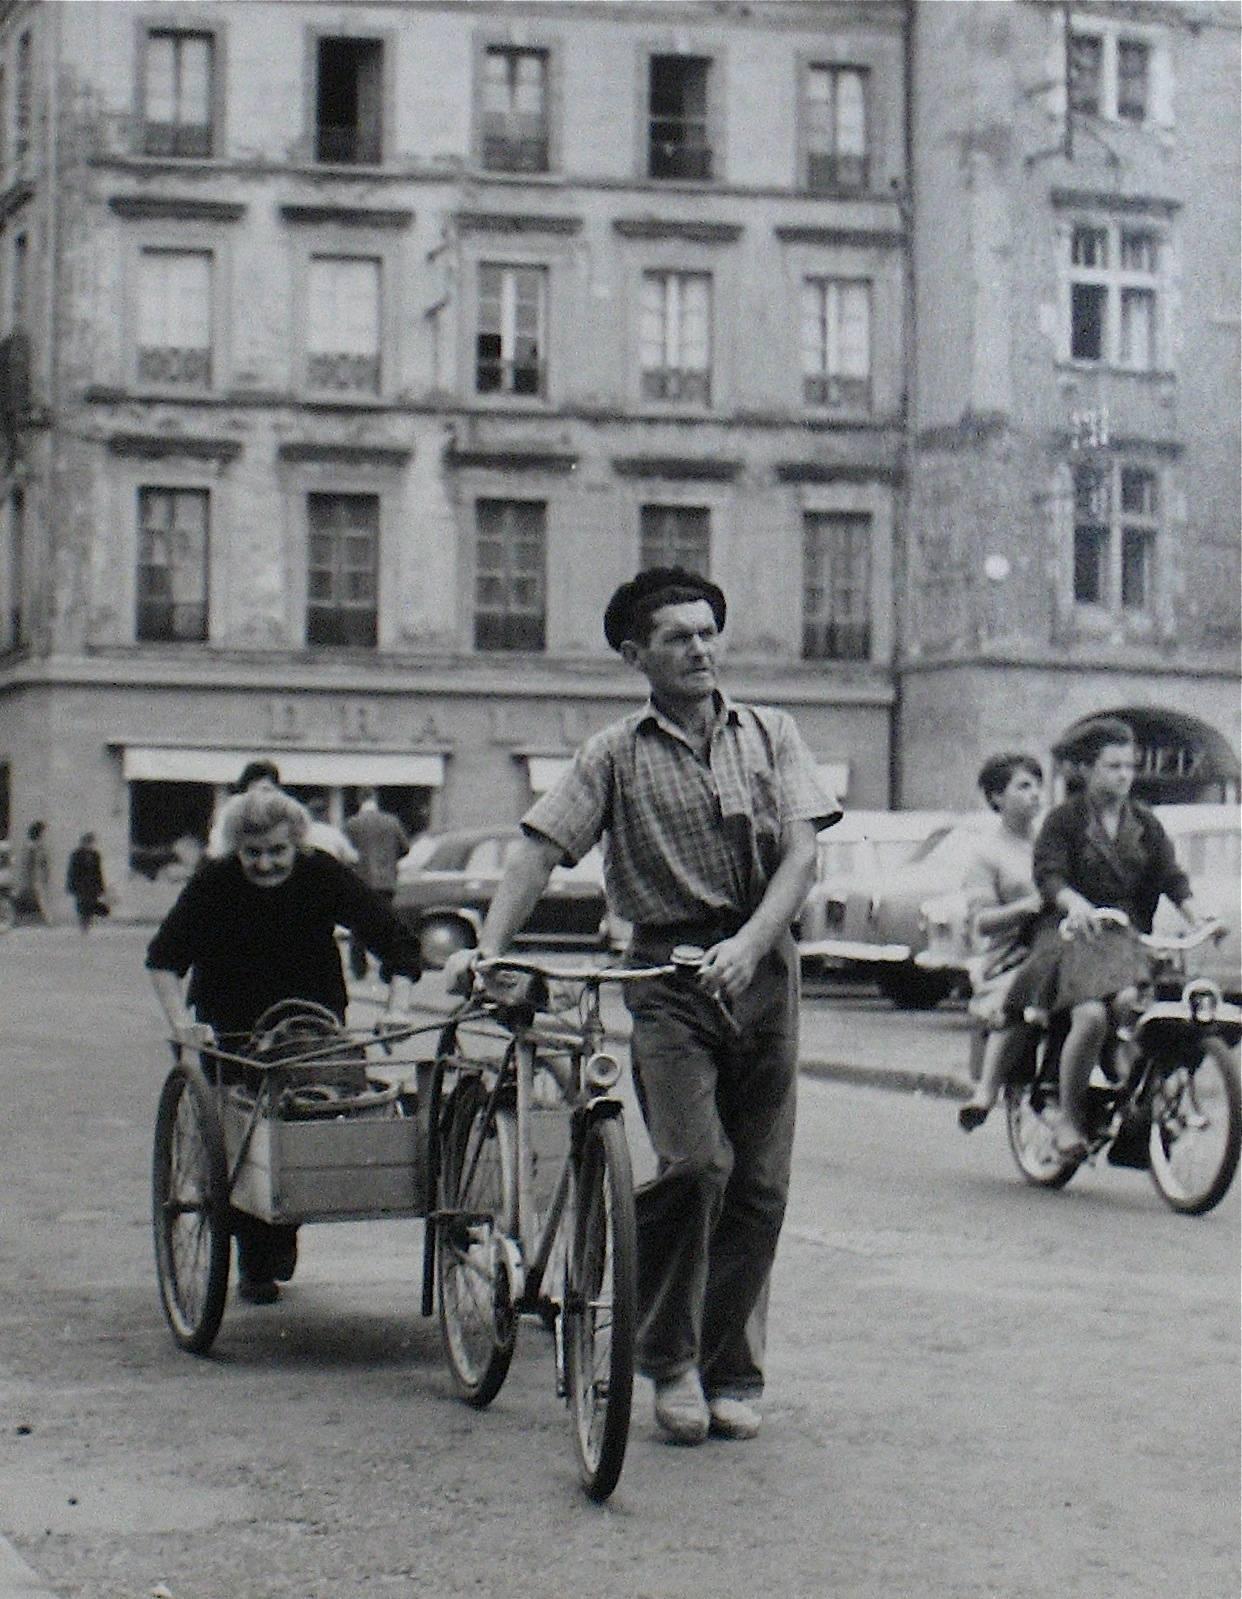 Man with a Bicycle, Yugoslavia, Silver Gelatin Print, 1960s